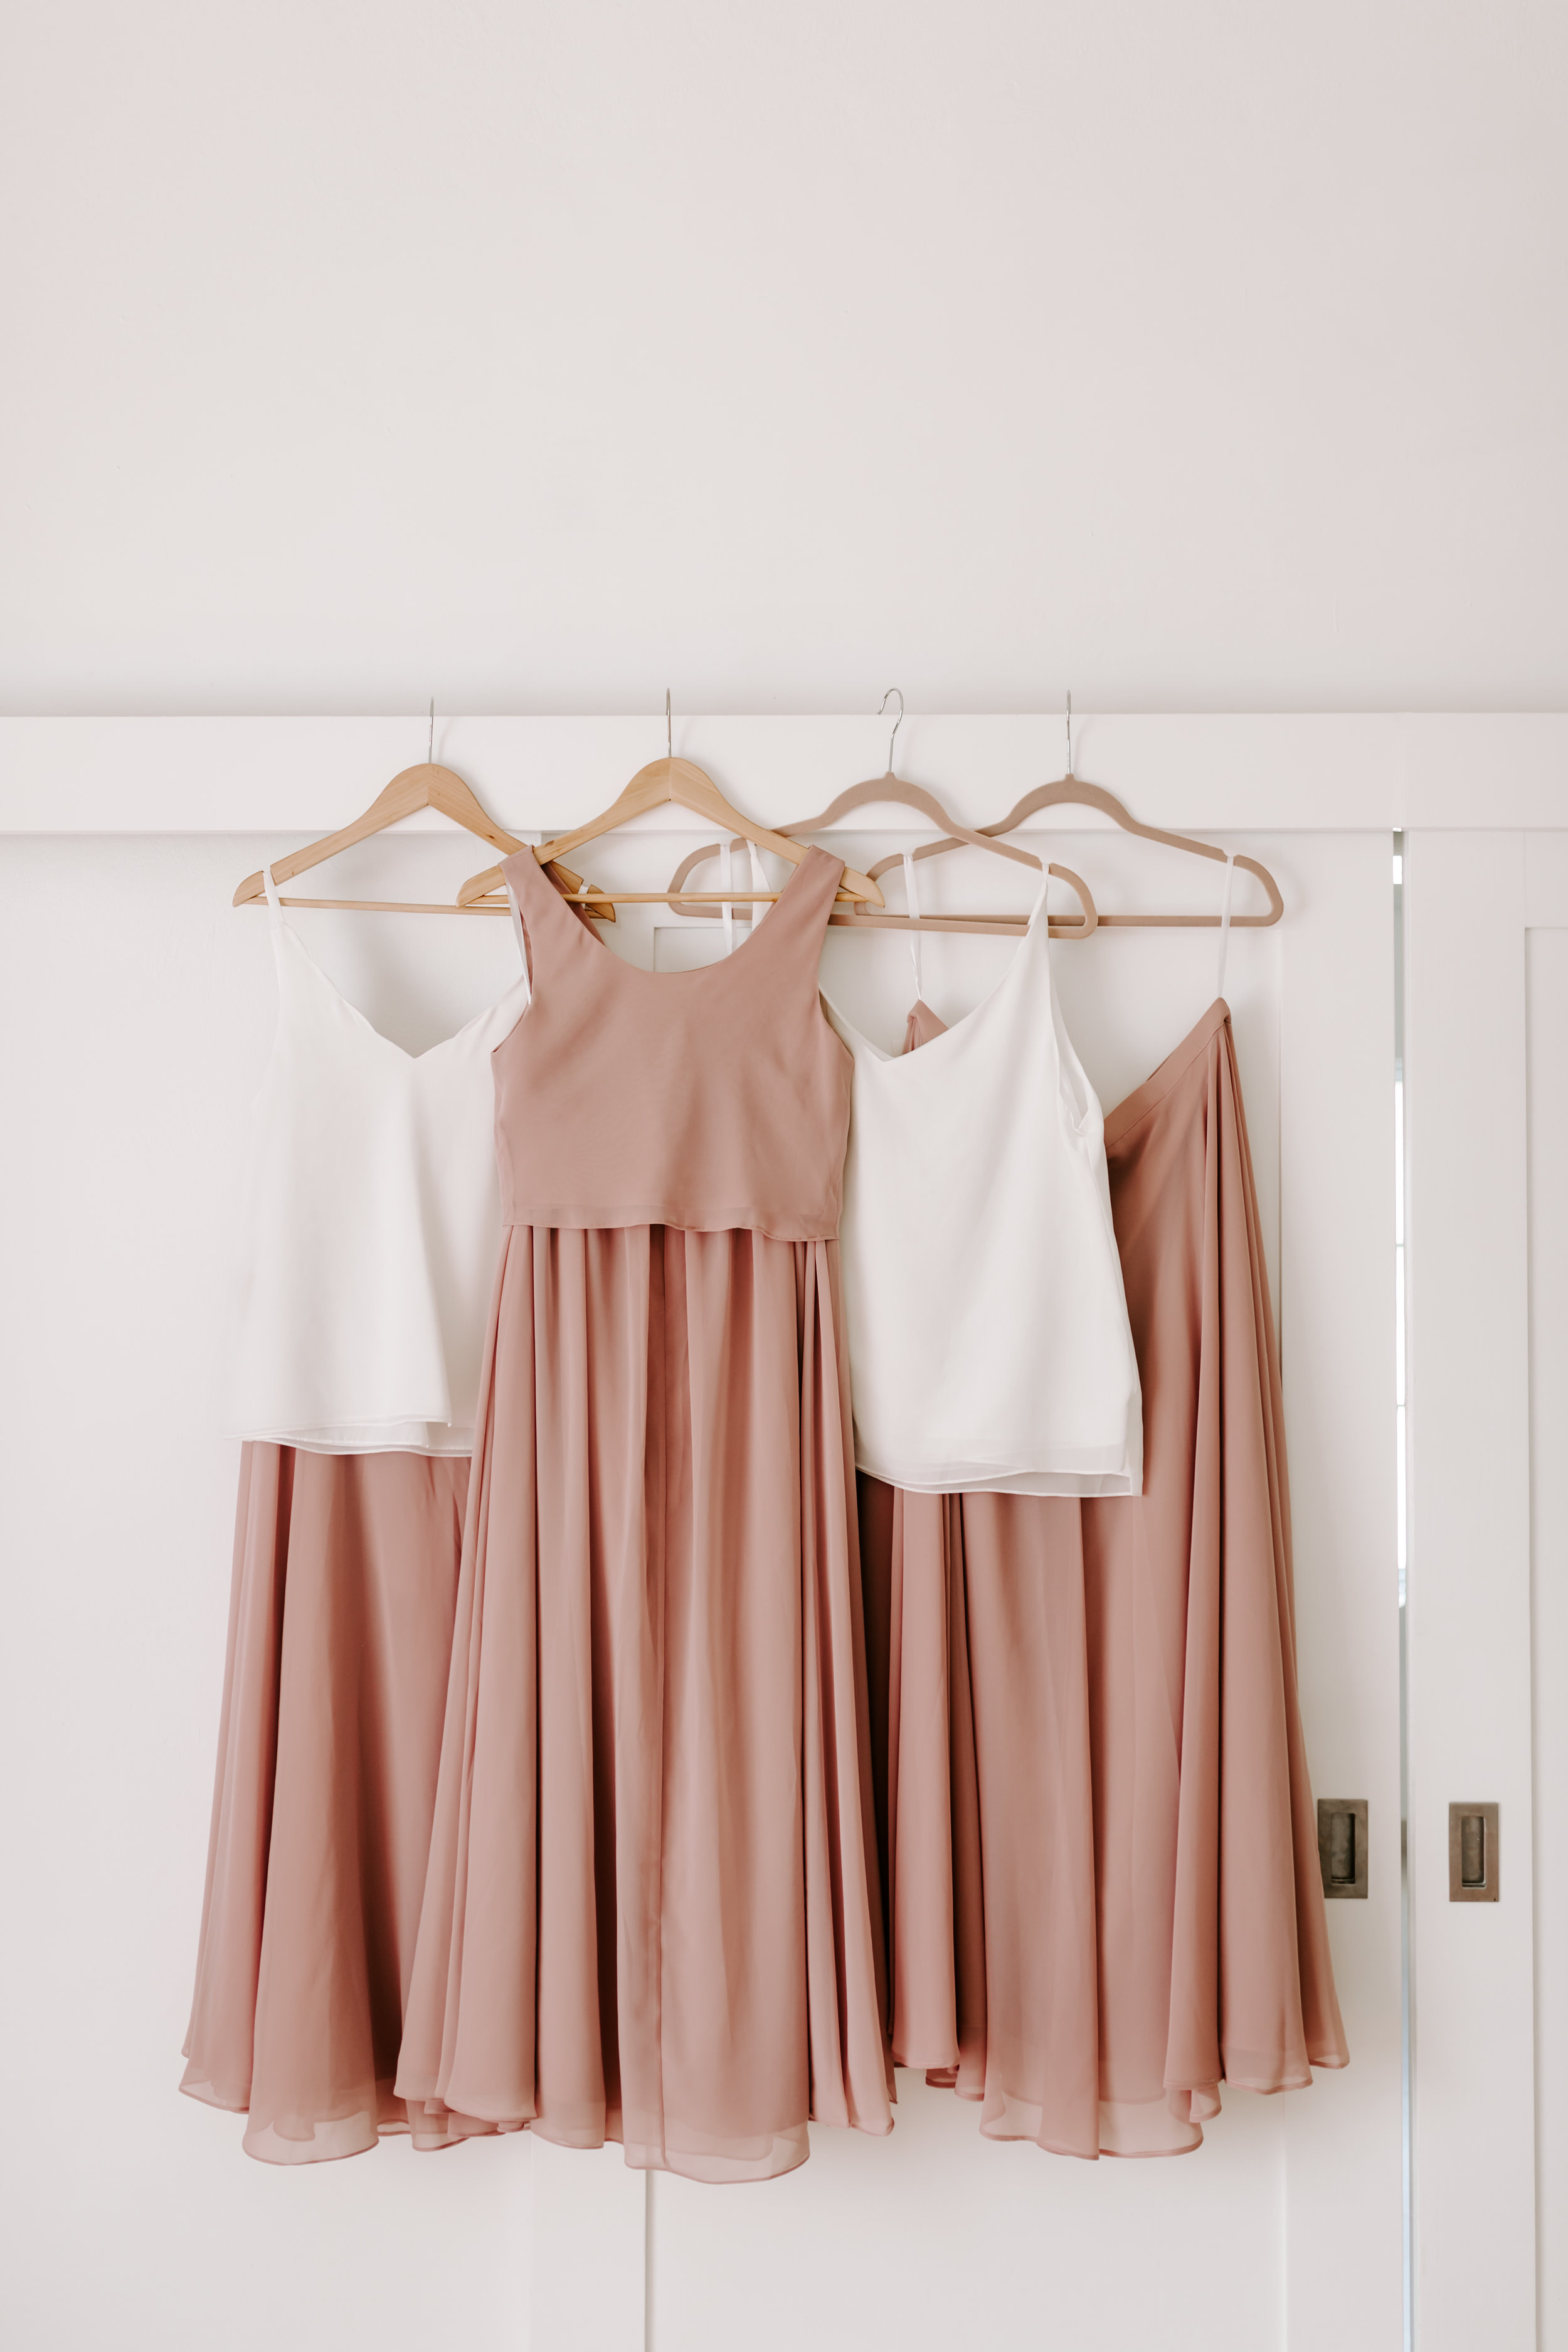 revelry, bridesmaids, 2 piece sets, 2 piece bridesmaids dresses, beach wedding, destination wedding, jamaica wedding recap